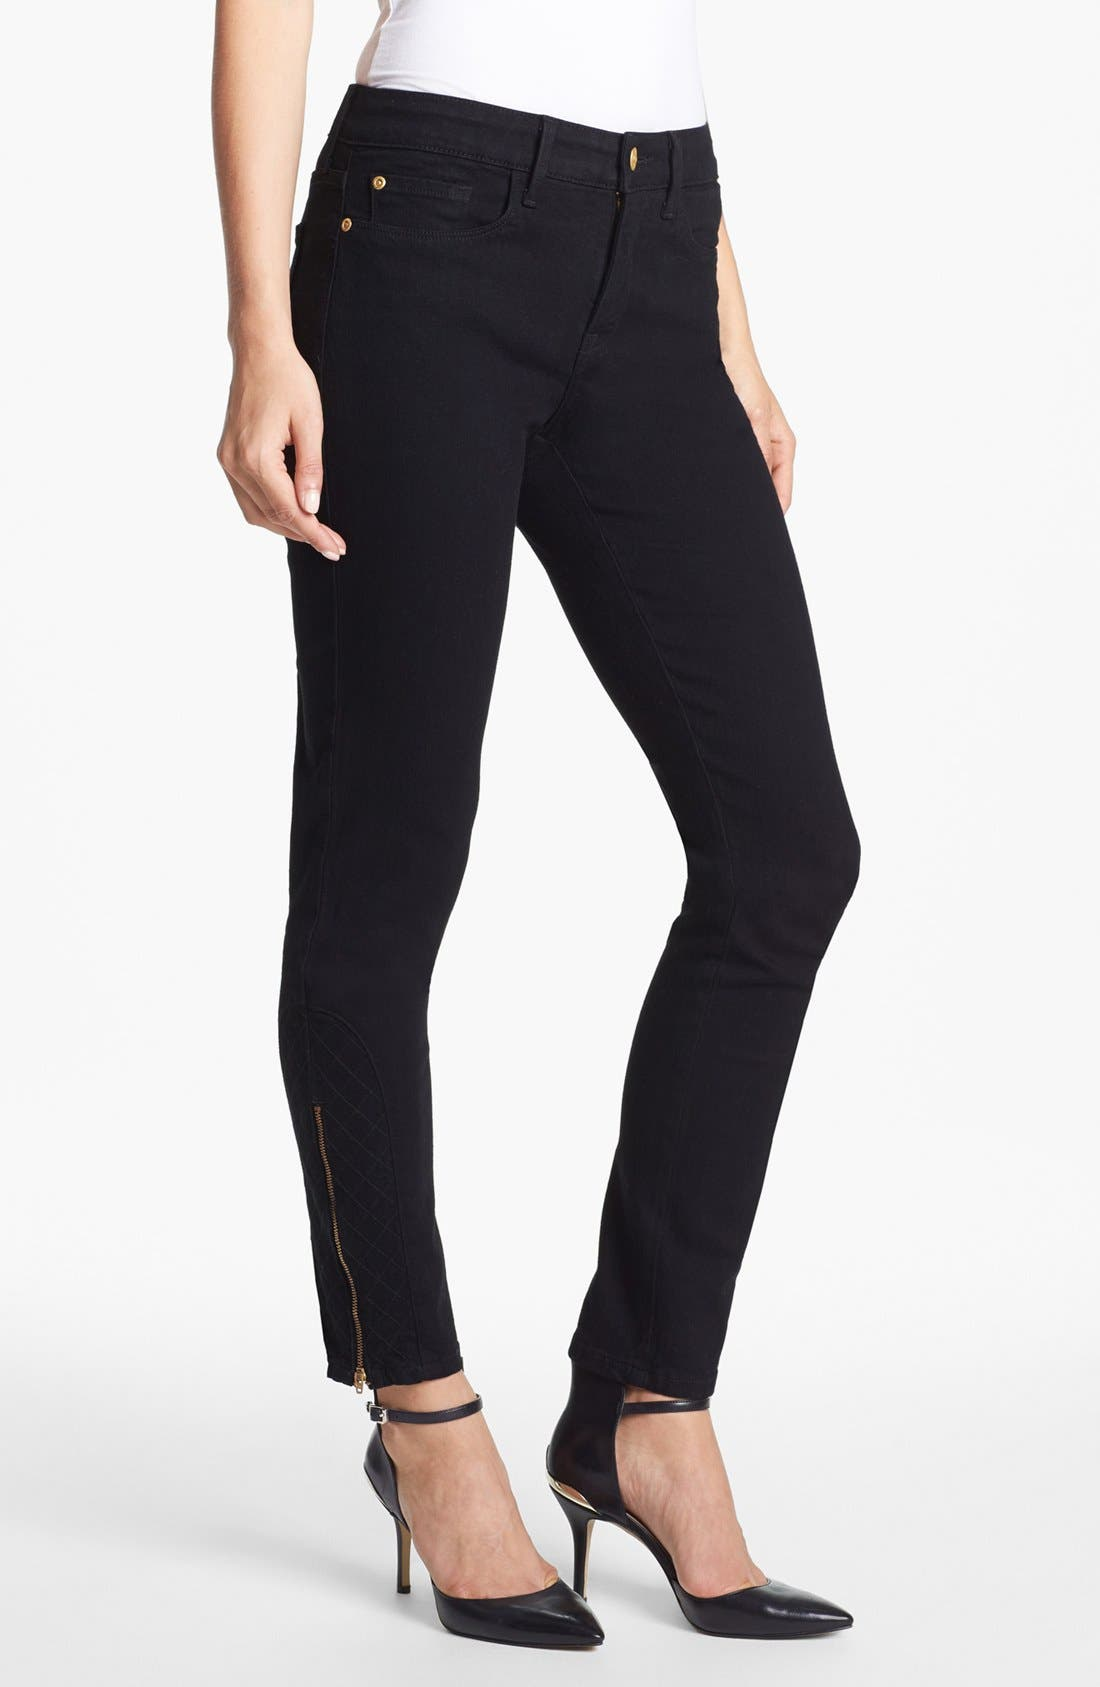 Alternate Image 1 Selected - NYDJ 'Arabella' Ankle Zip Stretch Skinny Jeans